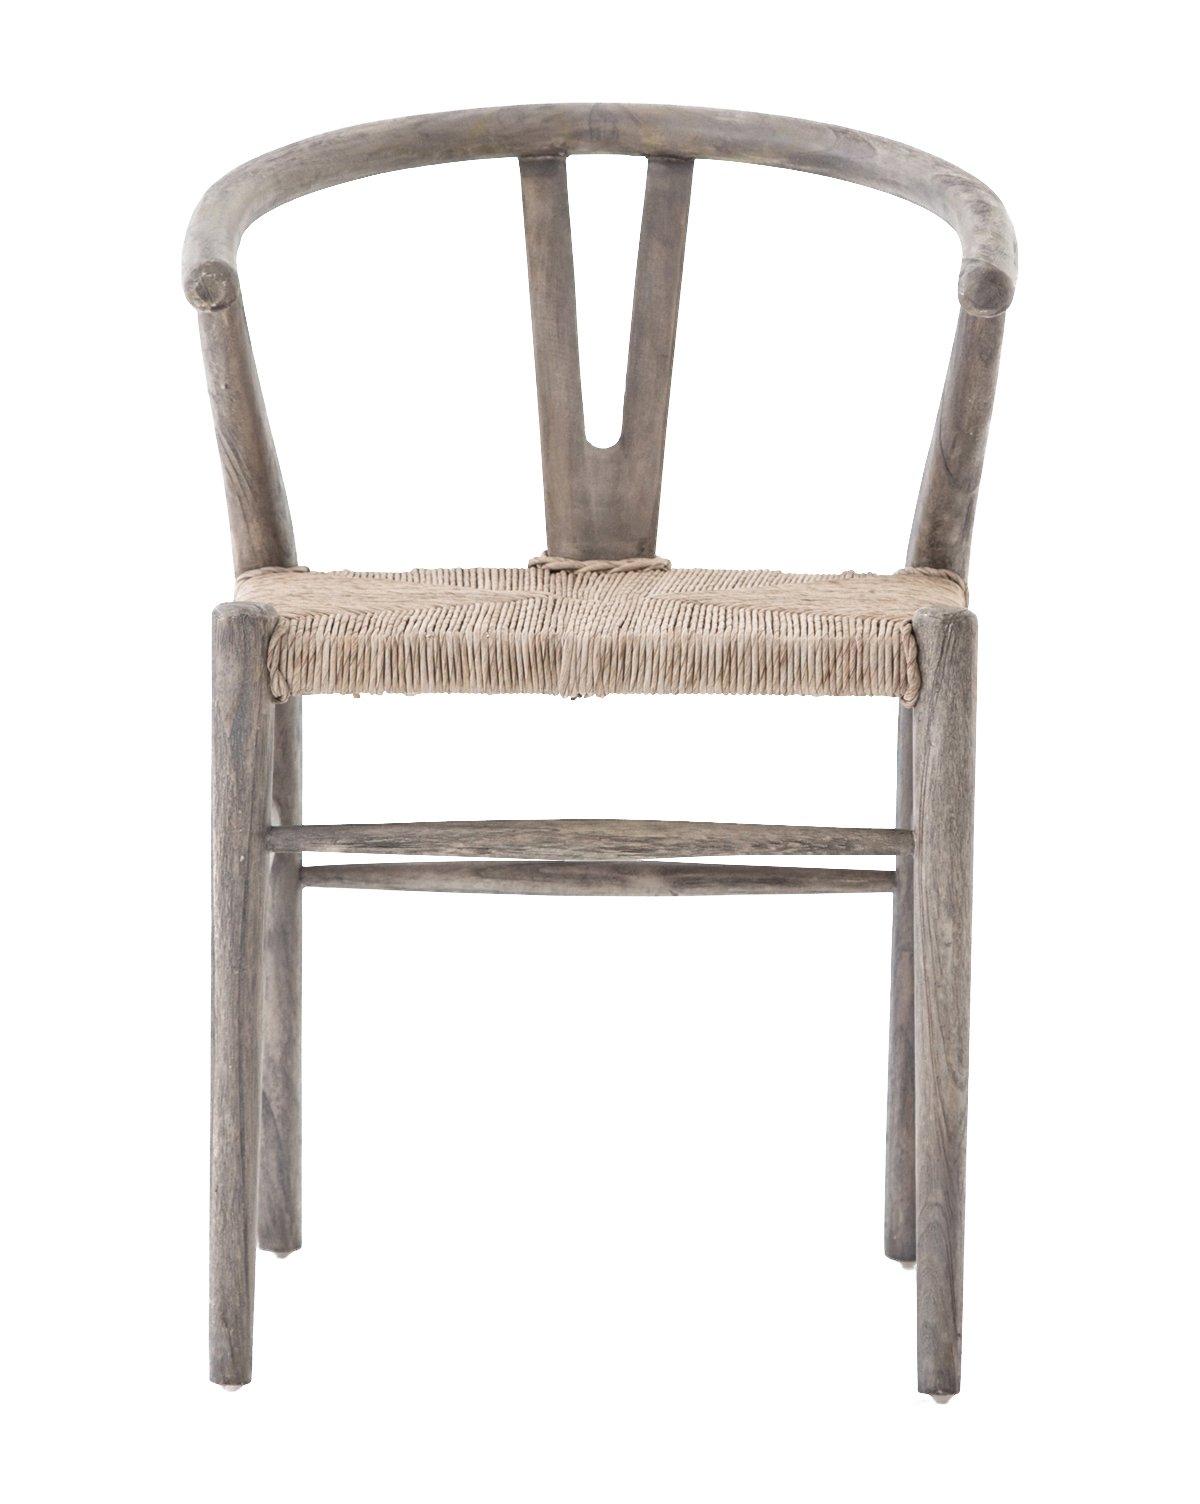 Gabriel_Arm_Dining_Chair_4_adaddd5b-d71f-44a2-9e0f-c17e686a3431.jpg